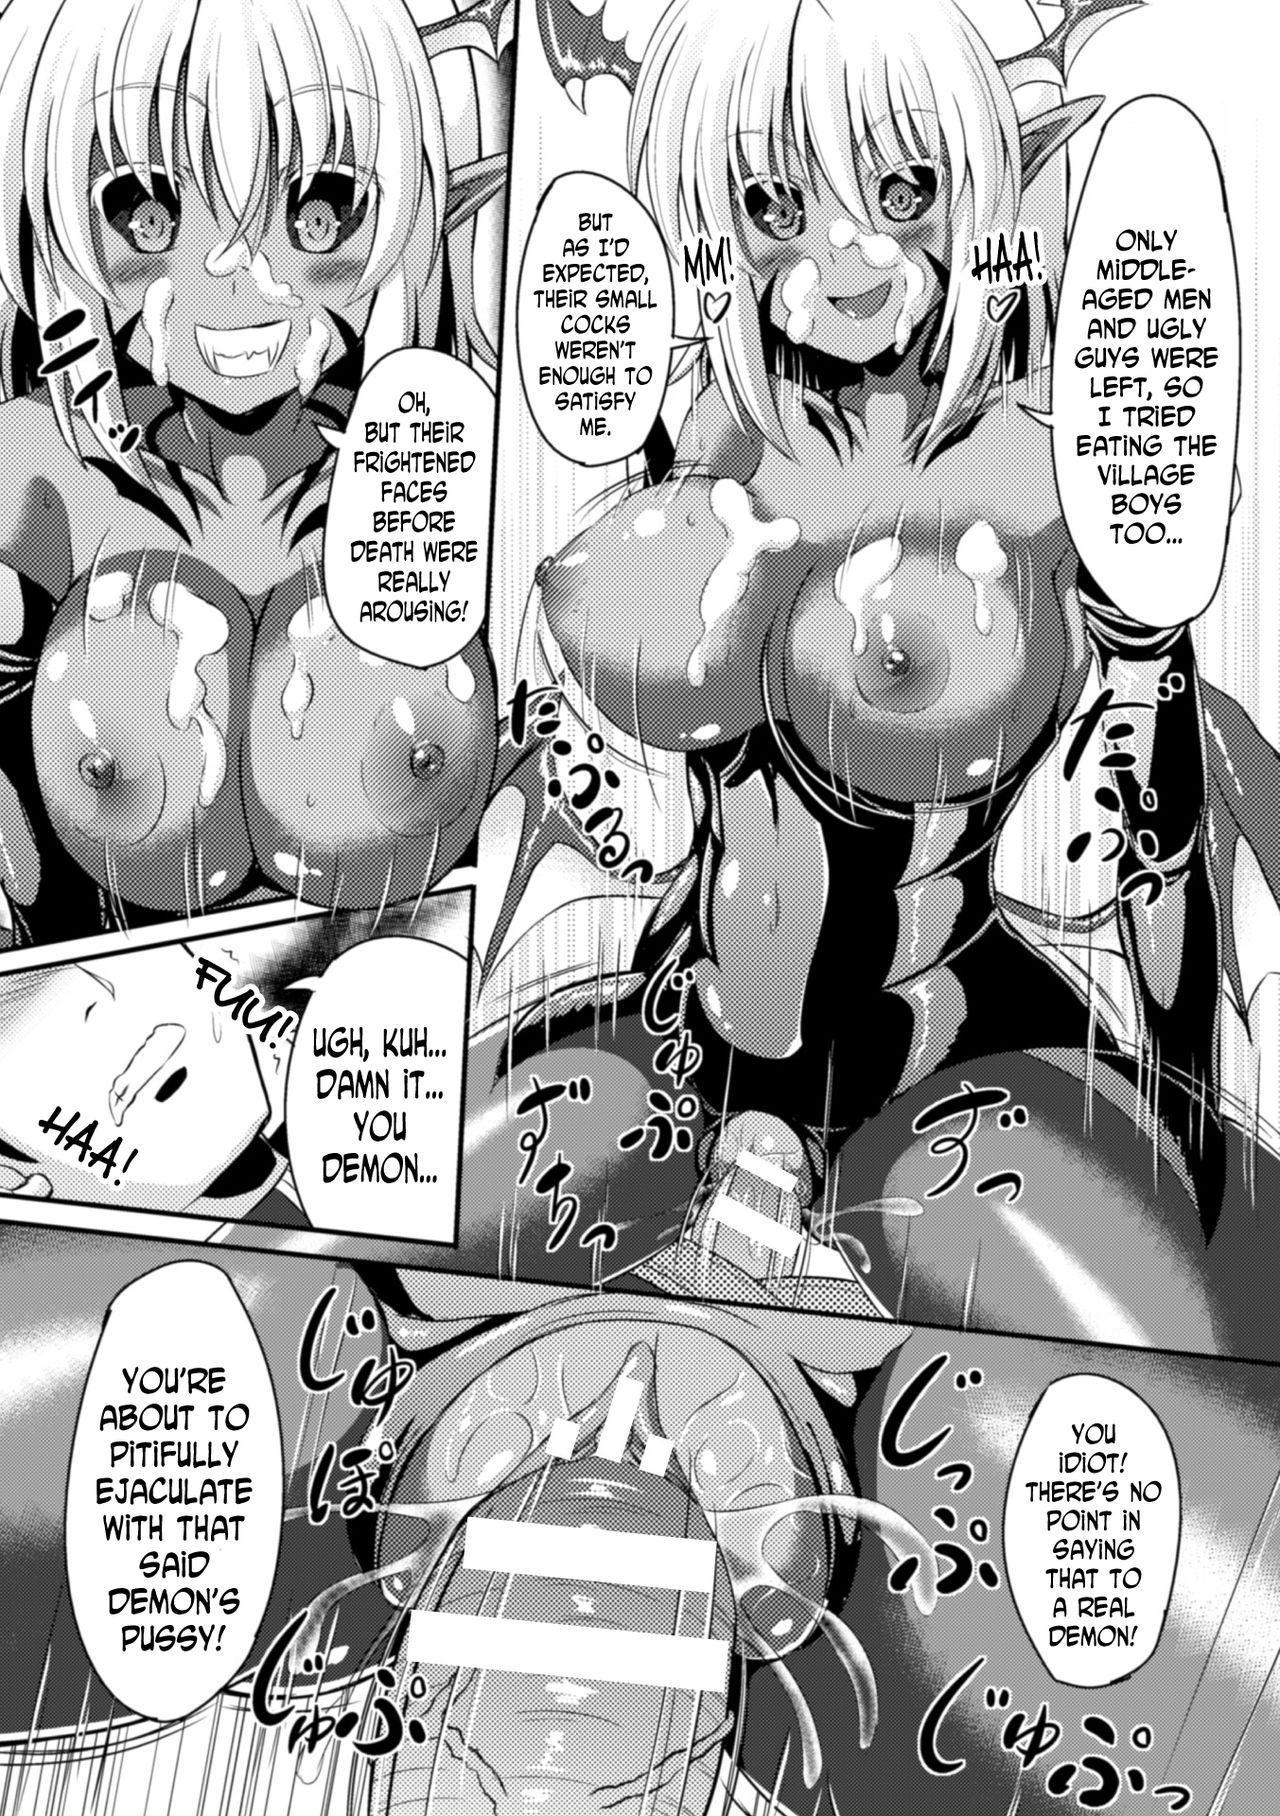 [Anthology] 2D Comic Magazine Tenshi ni Ochiru Akuma-tachi Vol. 1 Ch. 1-3 [English] [N04h] [Digital] 51